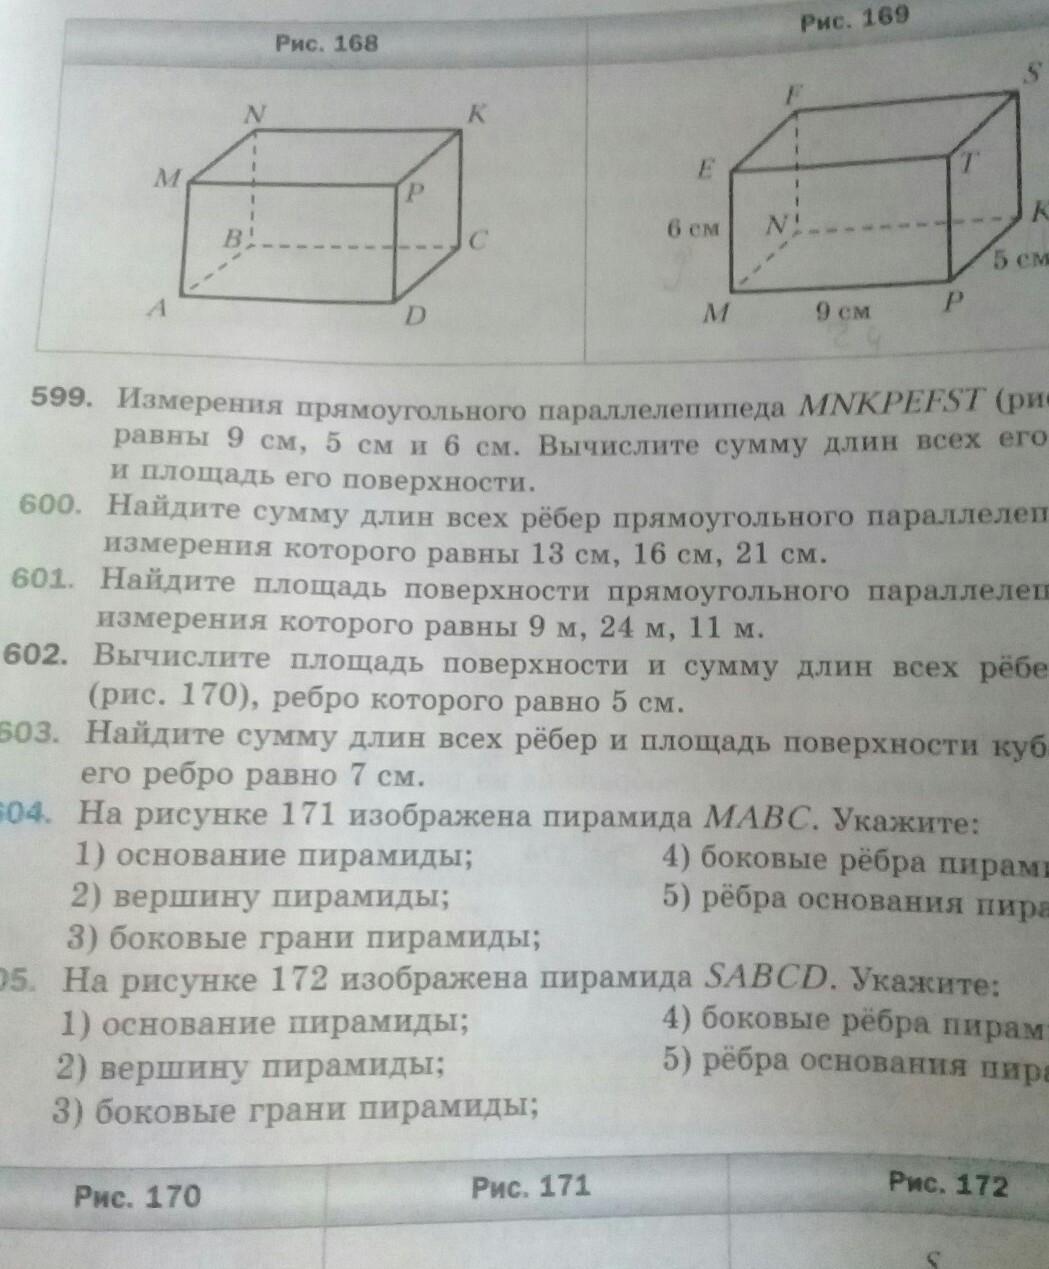 Математика 5 класс Мерзляк номер 600 601 Помогите